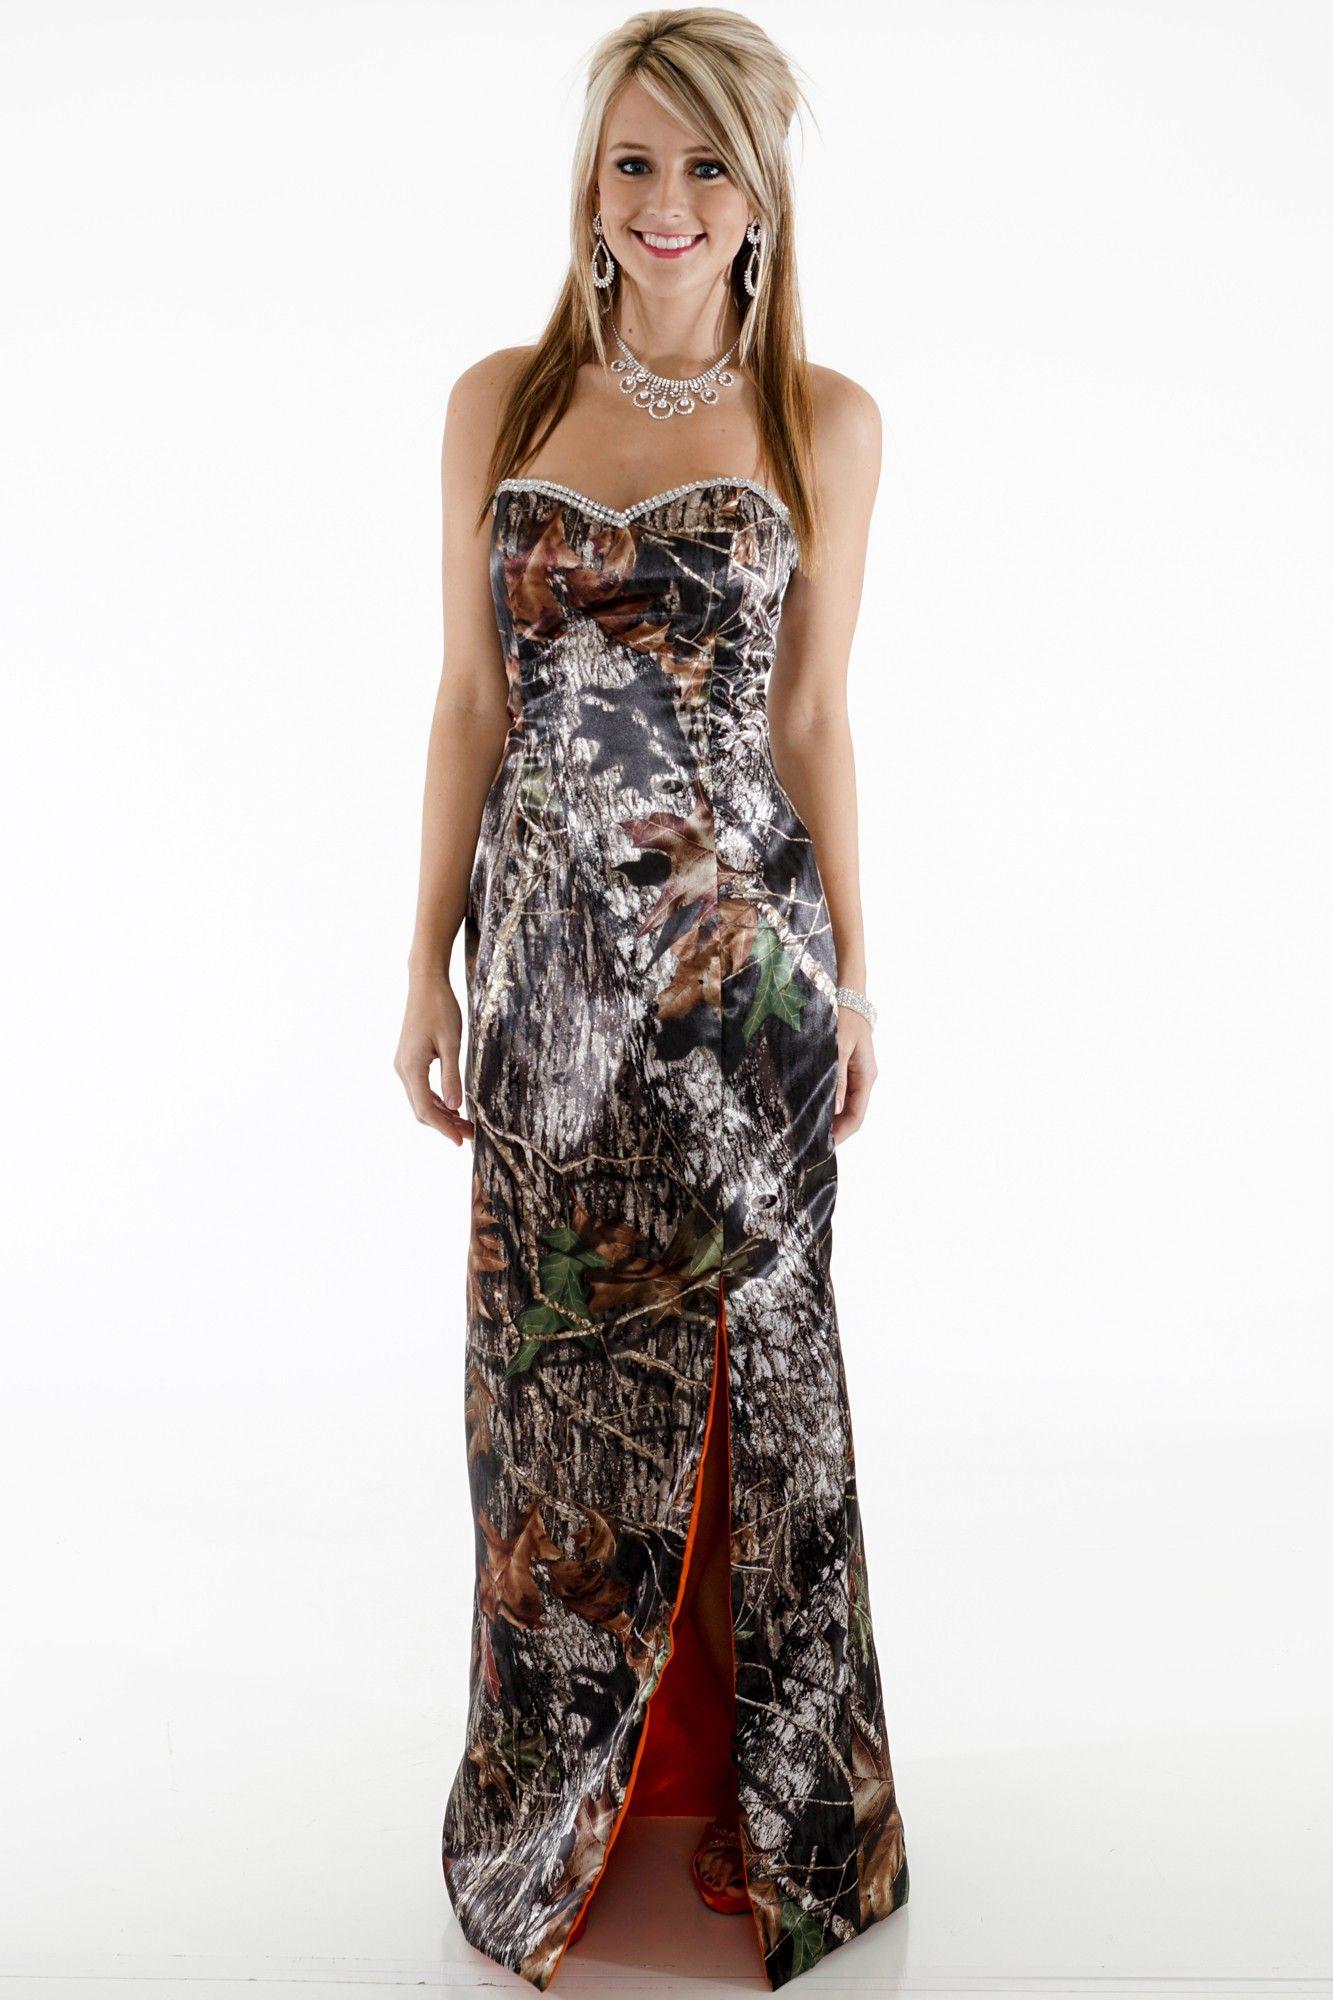 Camo and orange wedding dresses   Shown in Mossy Oak and Hunterus Orange  wedding  Pinterest